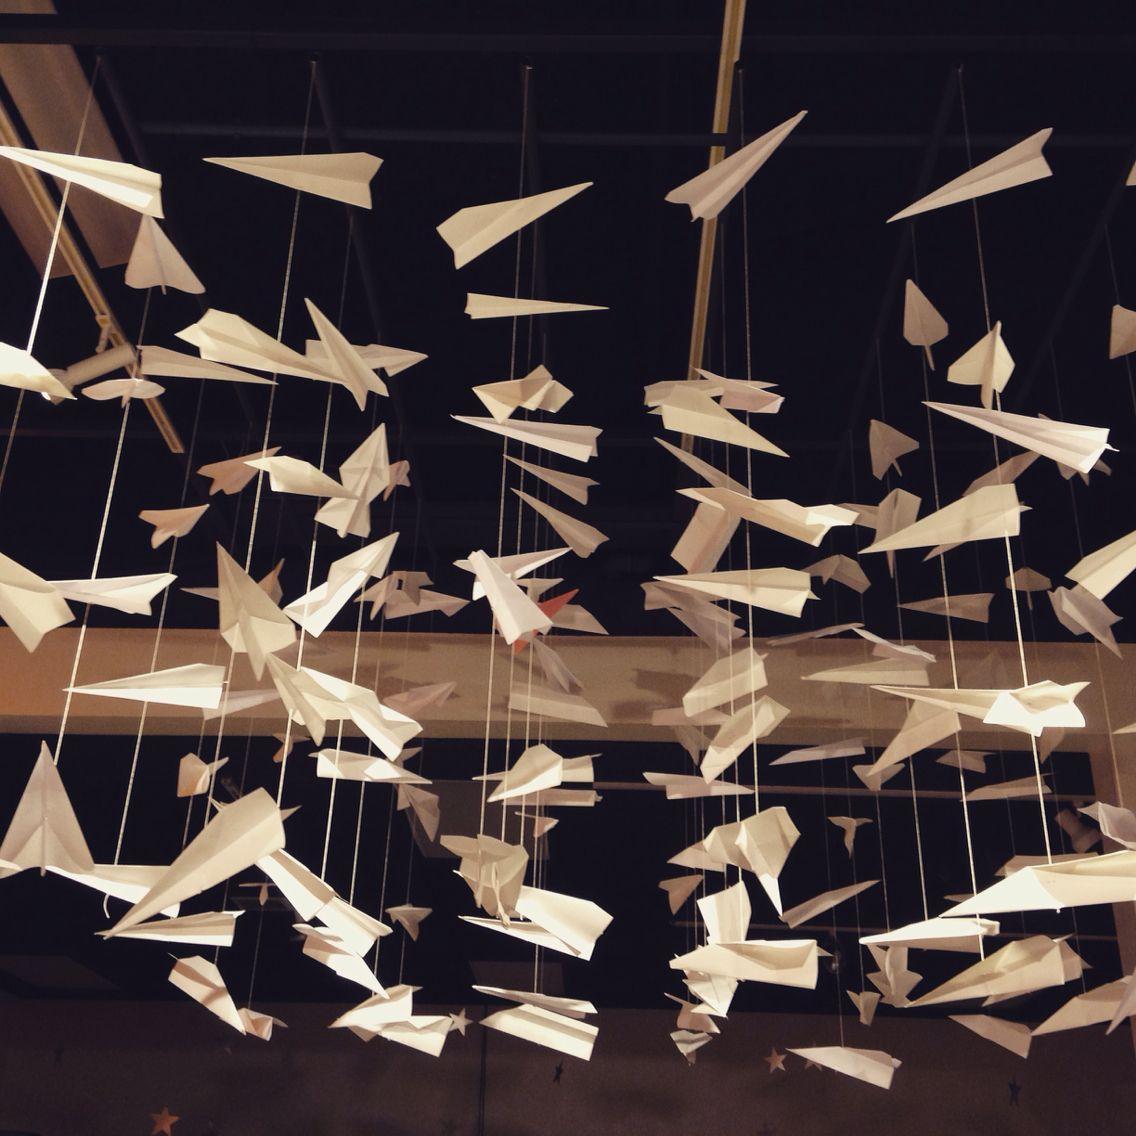 Discovery center boise ceiling lights inspiration light